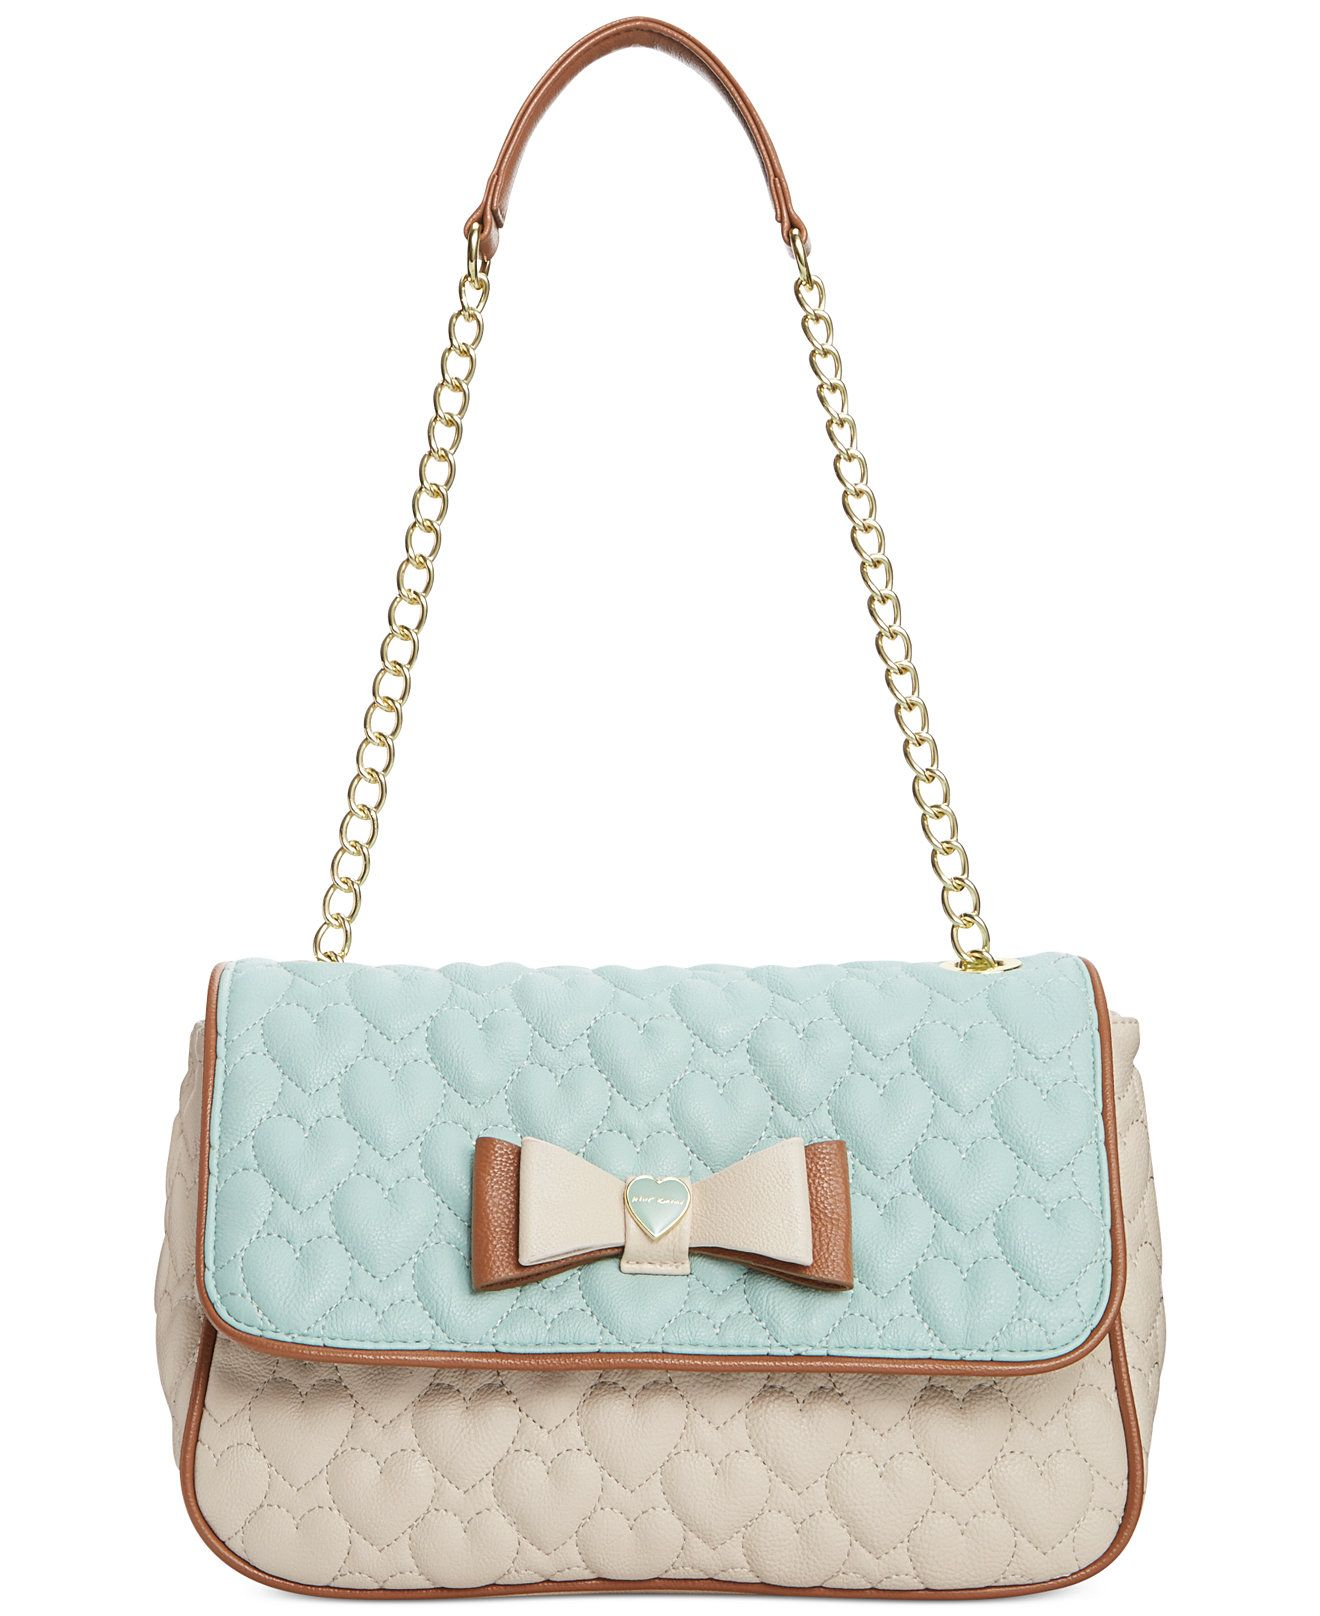 Betsey Johnson Macy's Exclusive Shoulder Bag - Shoulder Bags - Handbags & Accessories - Macy's